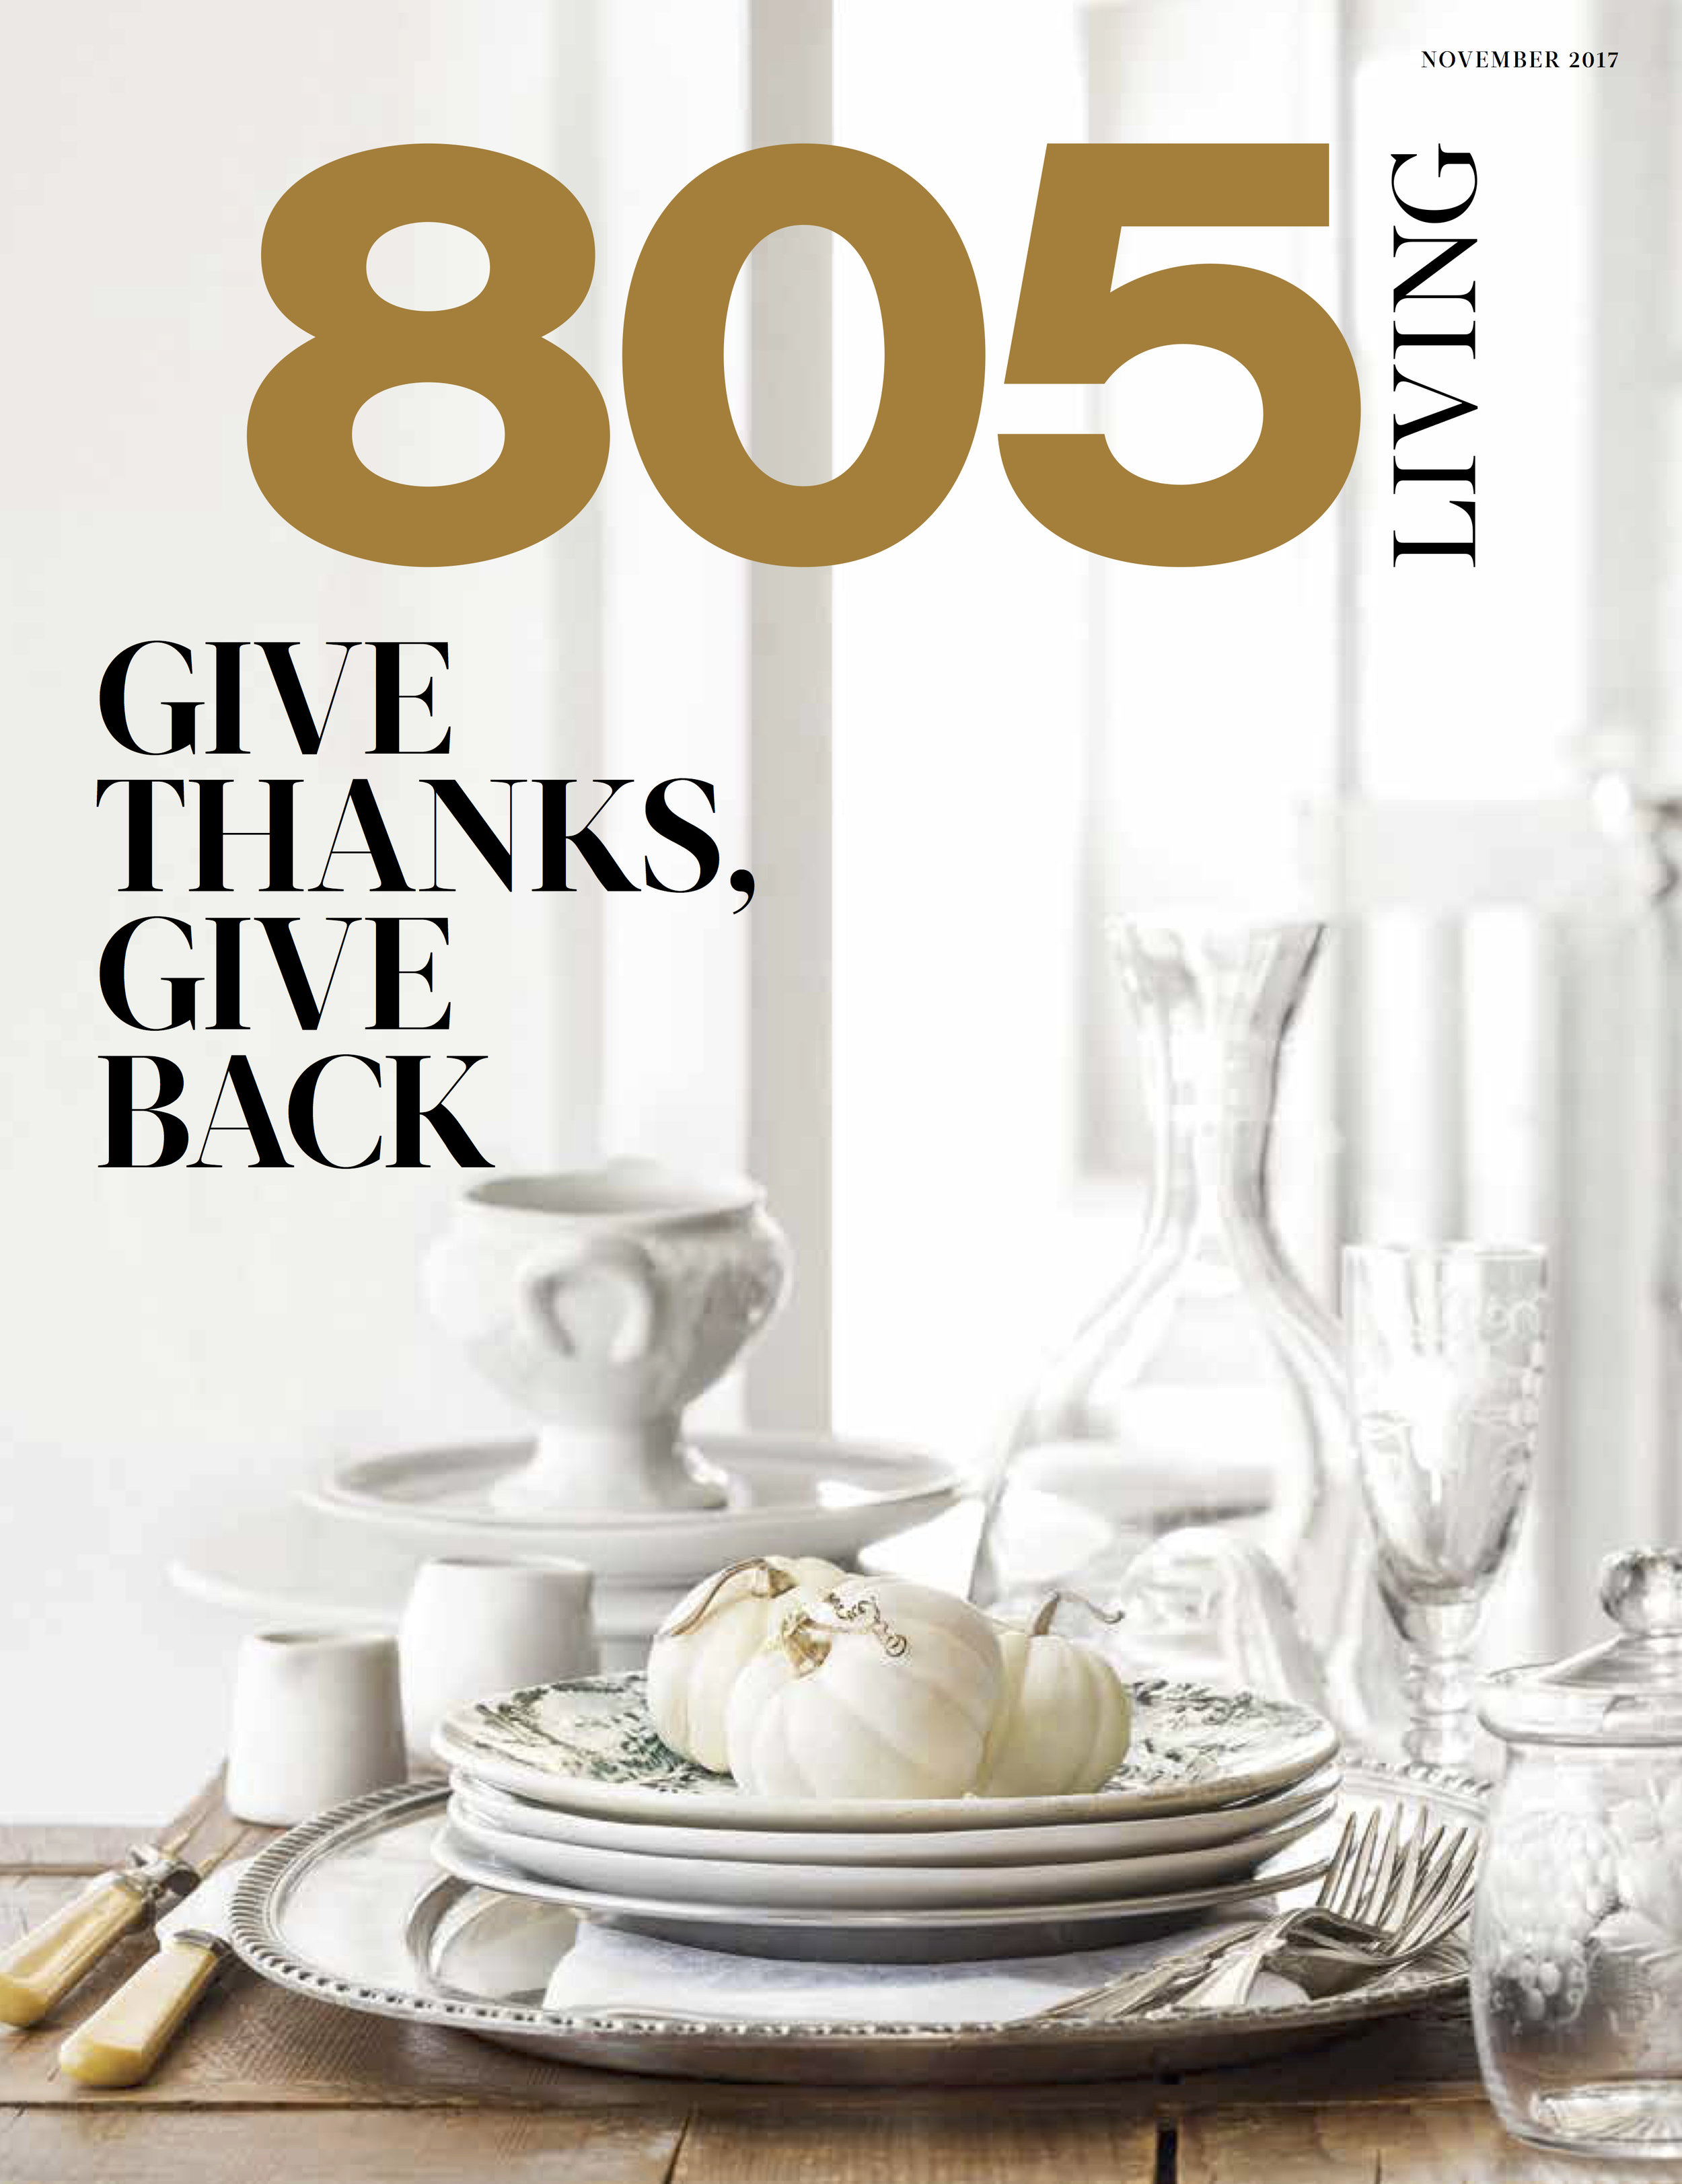 805 Living Nov 2017 Elemental Good Deeds.jpg